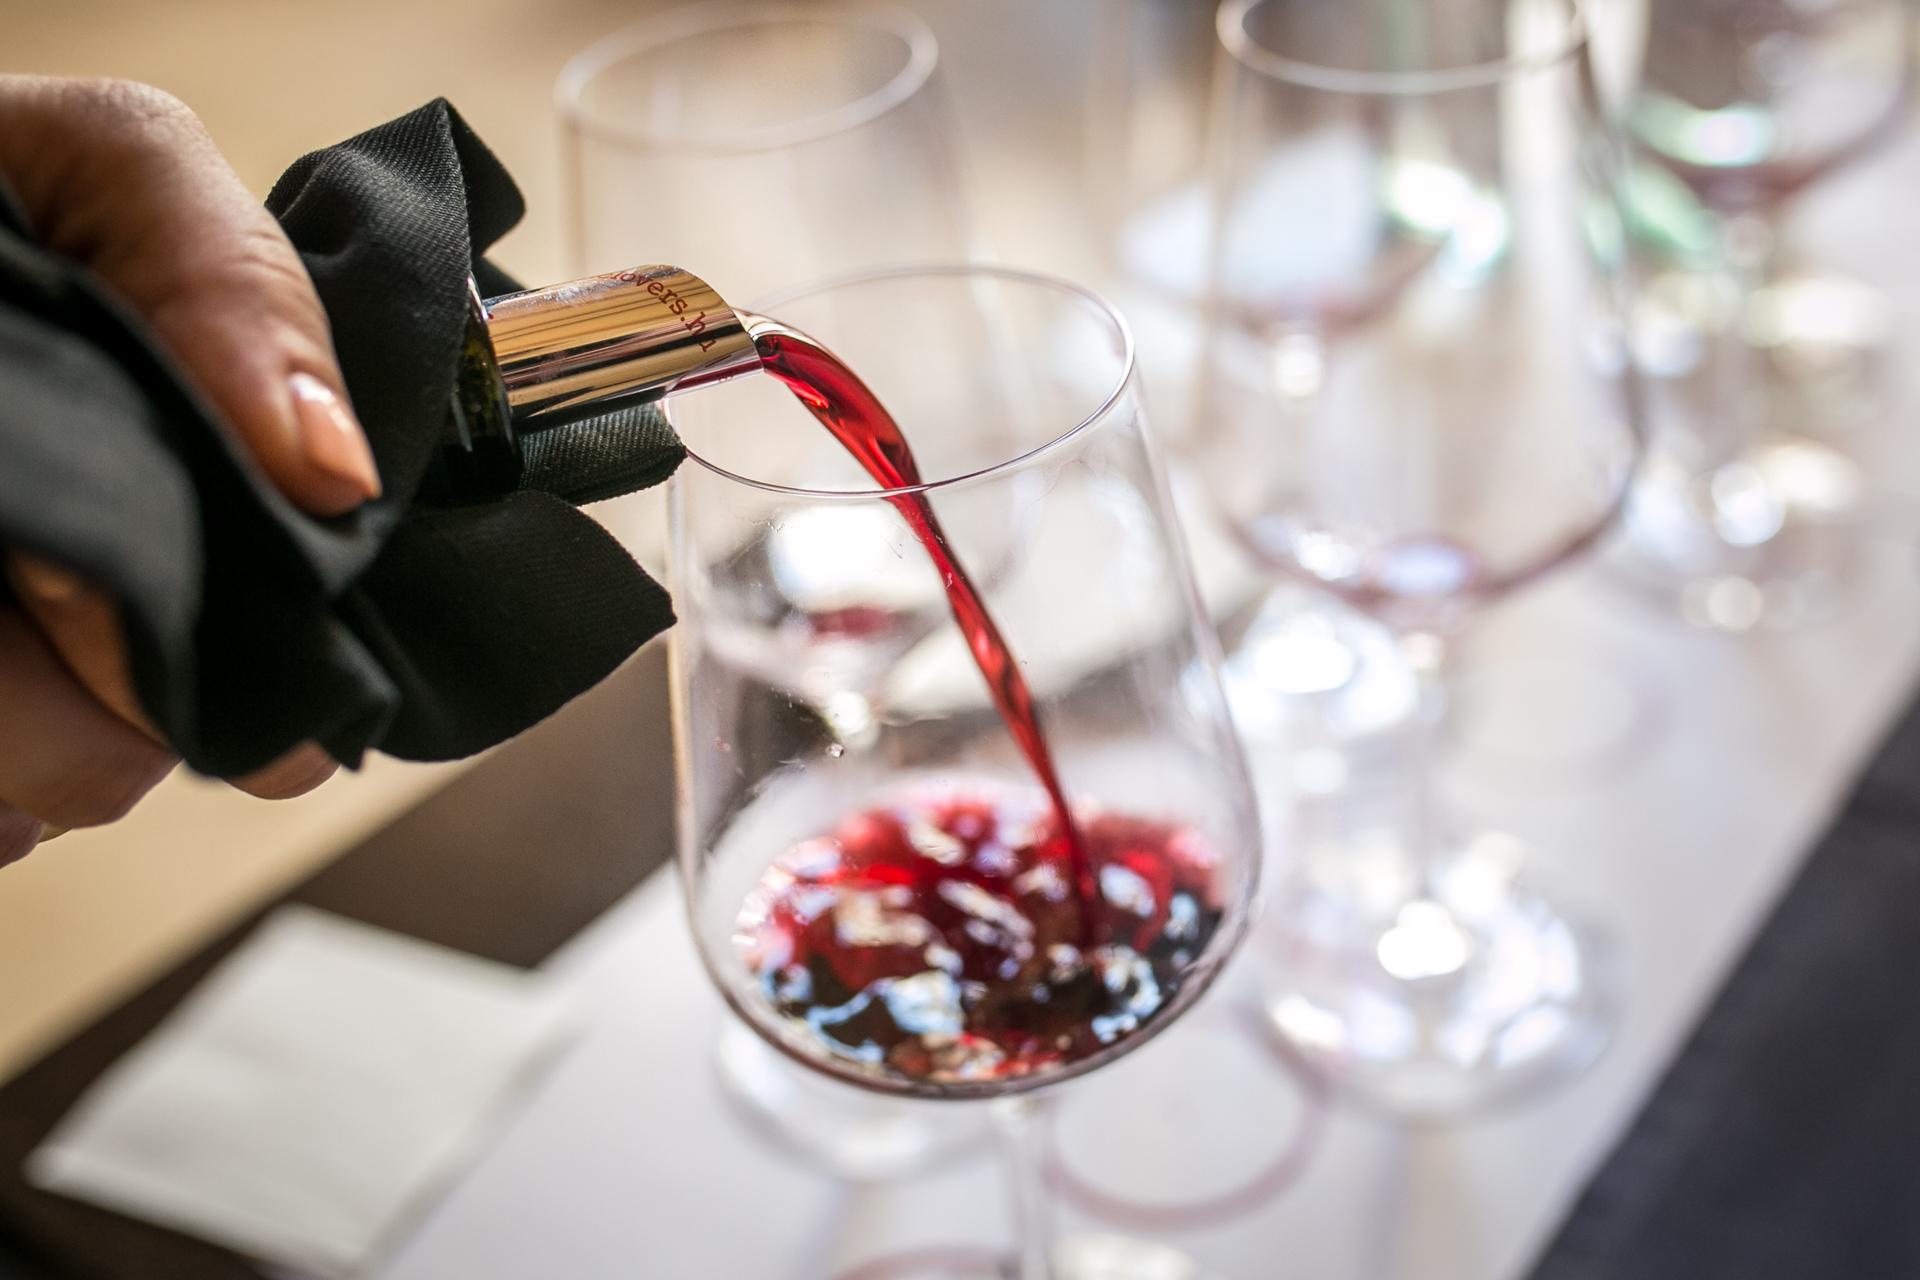 winelovers_aprilisi_borteszt-5567-20170403.jpg